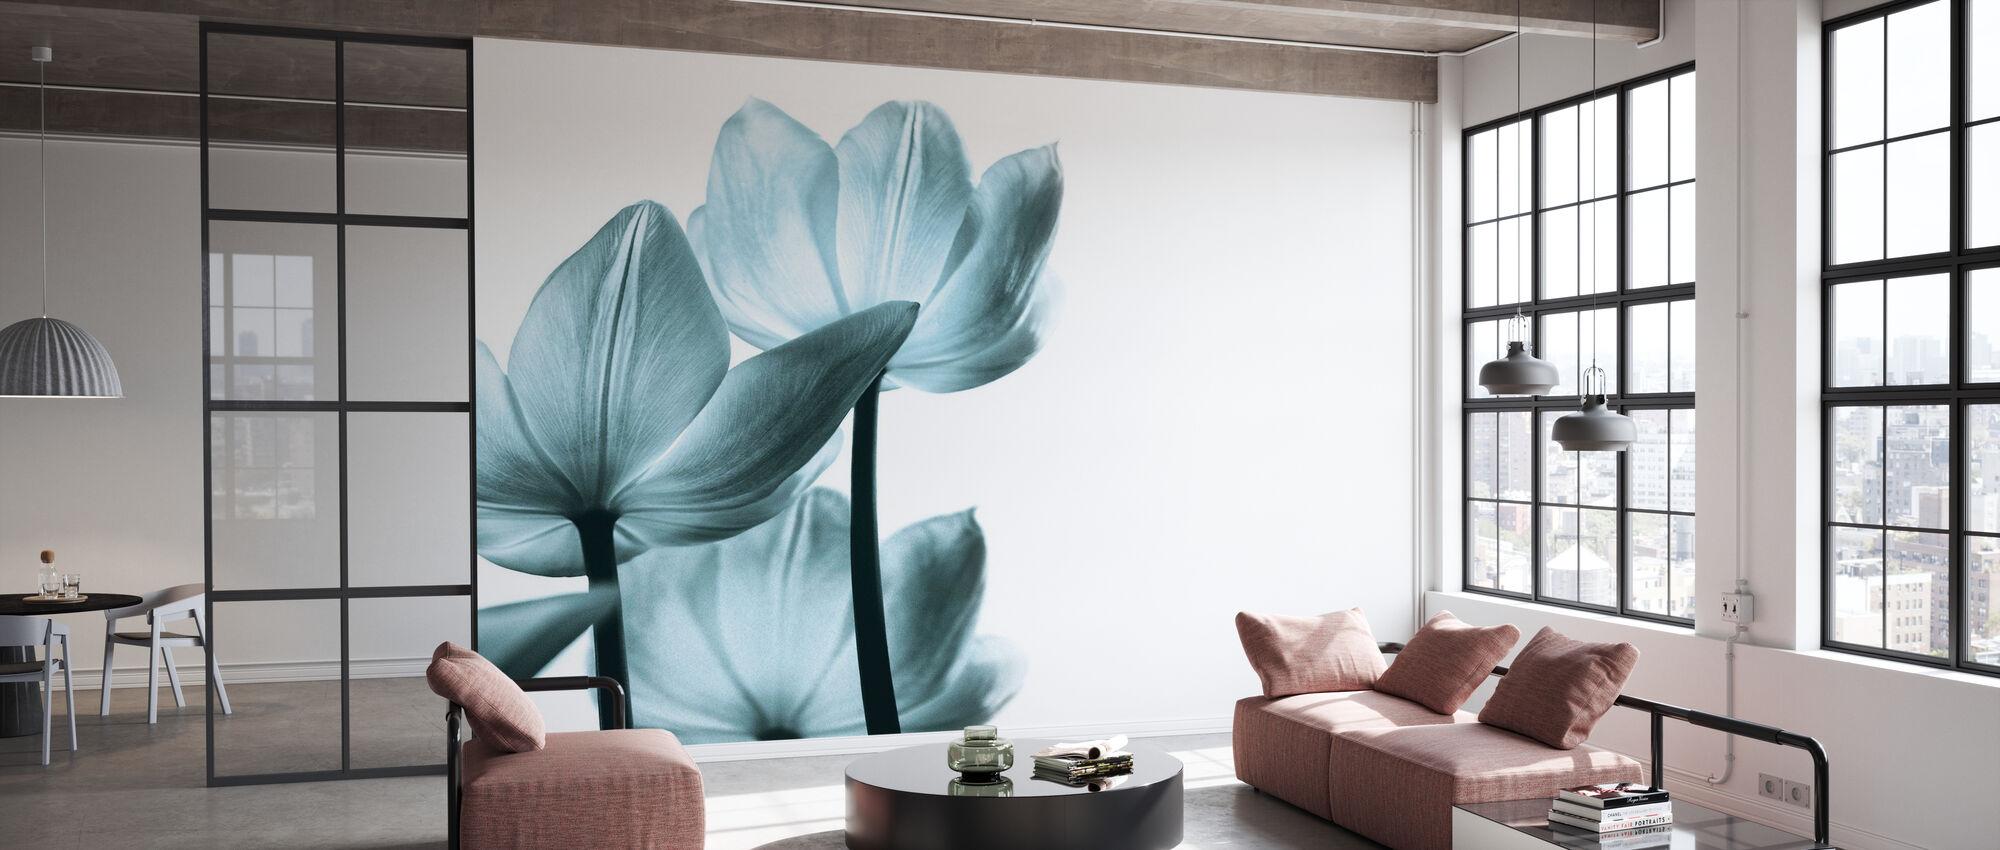 Transluzente Tulpen - Tapete - Büro